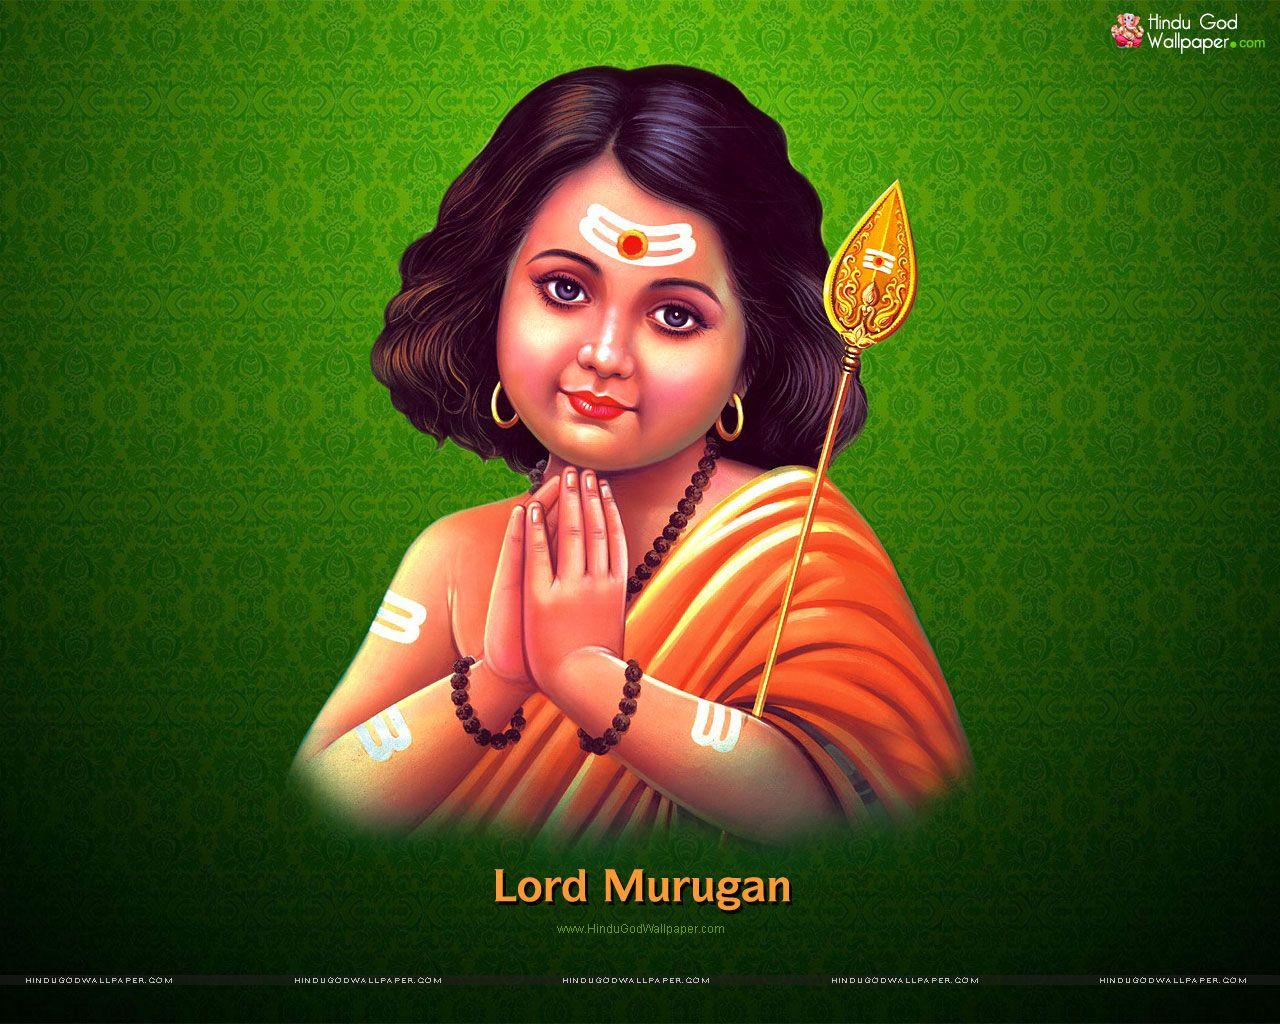 Bala Murugan Wallpapers Images Free Download Lord Murugan Wallpapers Lord Murugan Shiva Lord Wallpapers